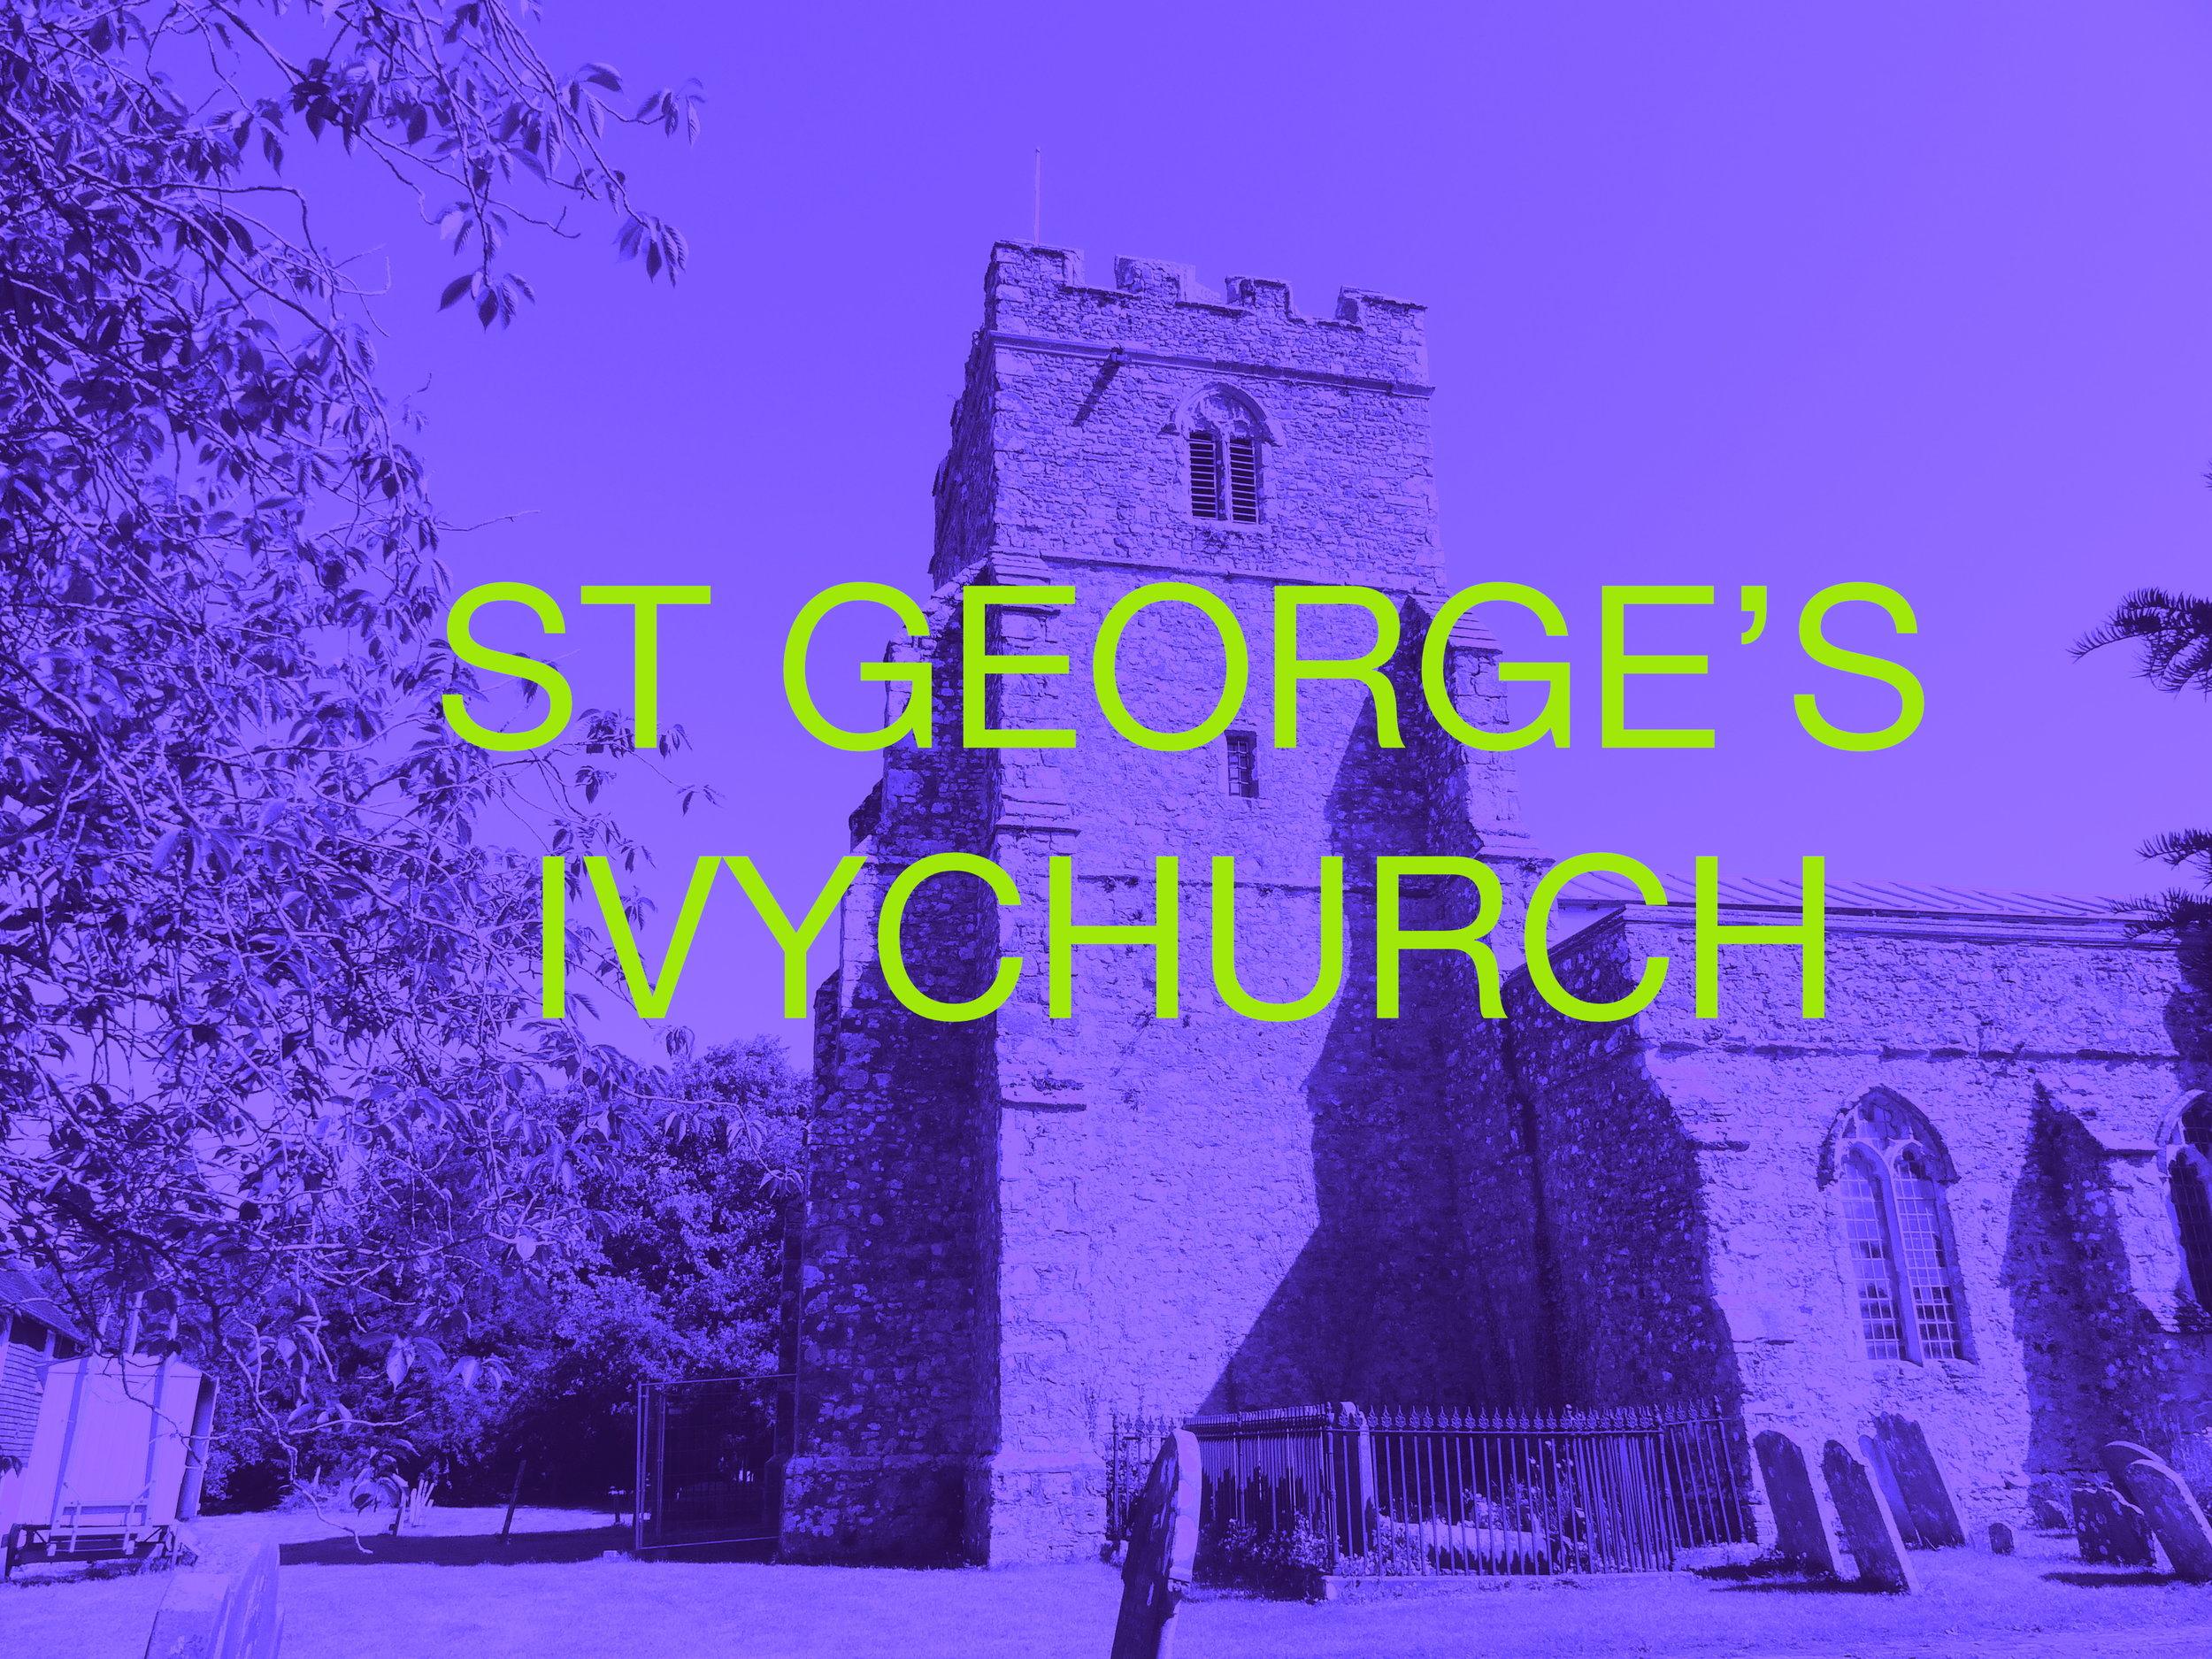 st george's church ivychurch.JPG